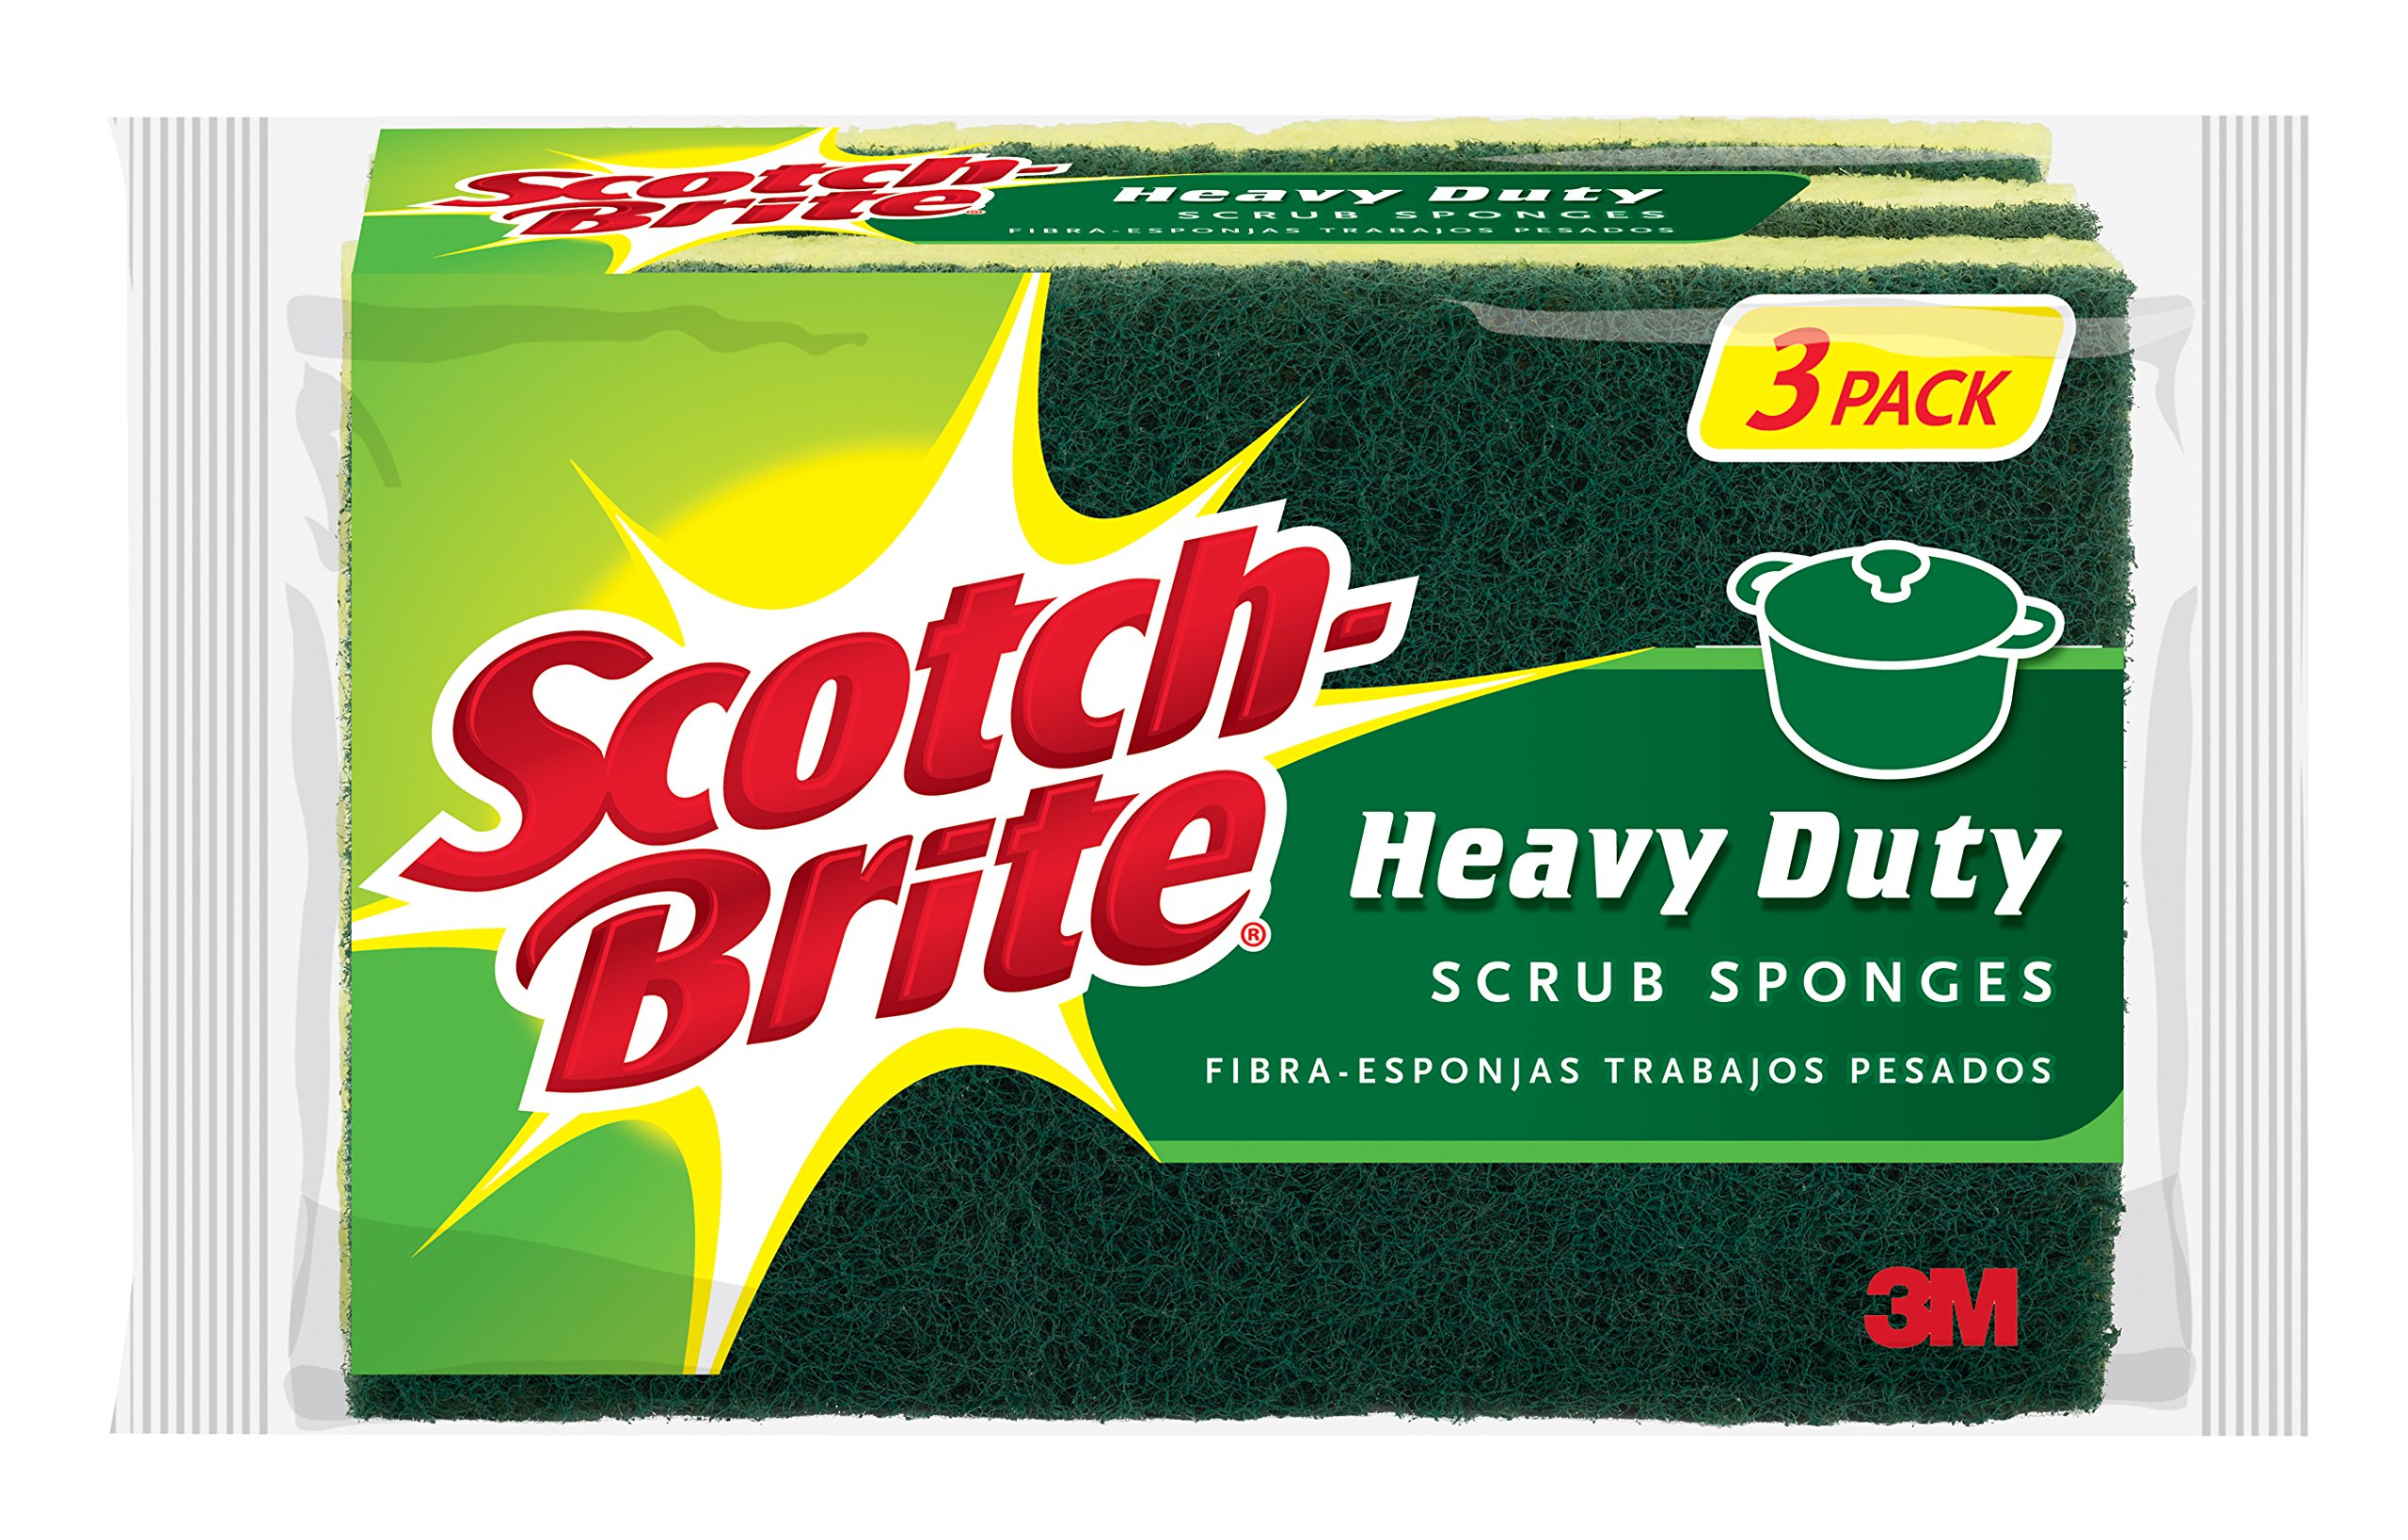 Scotch-Brite Heavy Duty Scrub Sponge, 3-Sponges/Pk, 8-Packs (24 Sponges Total)